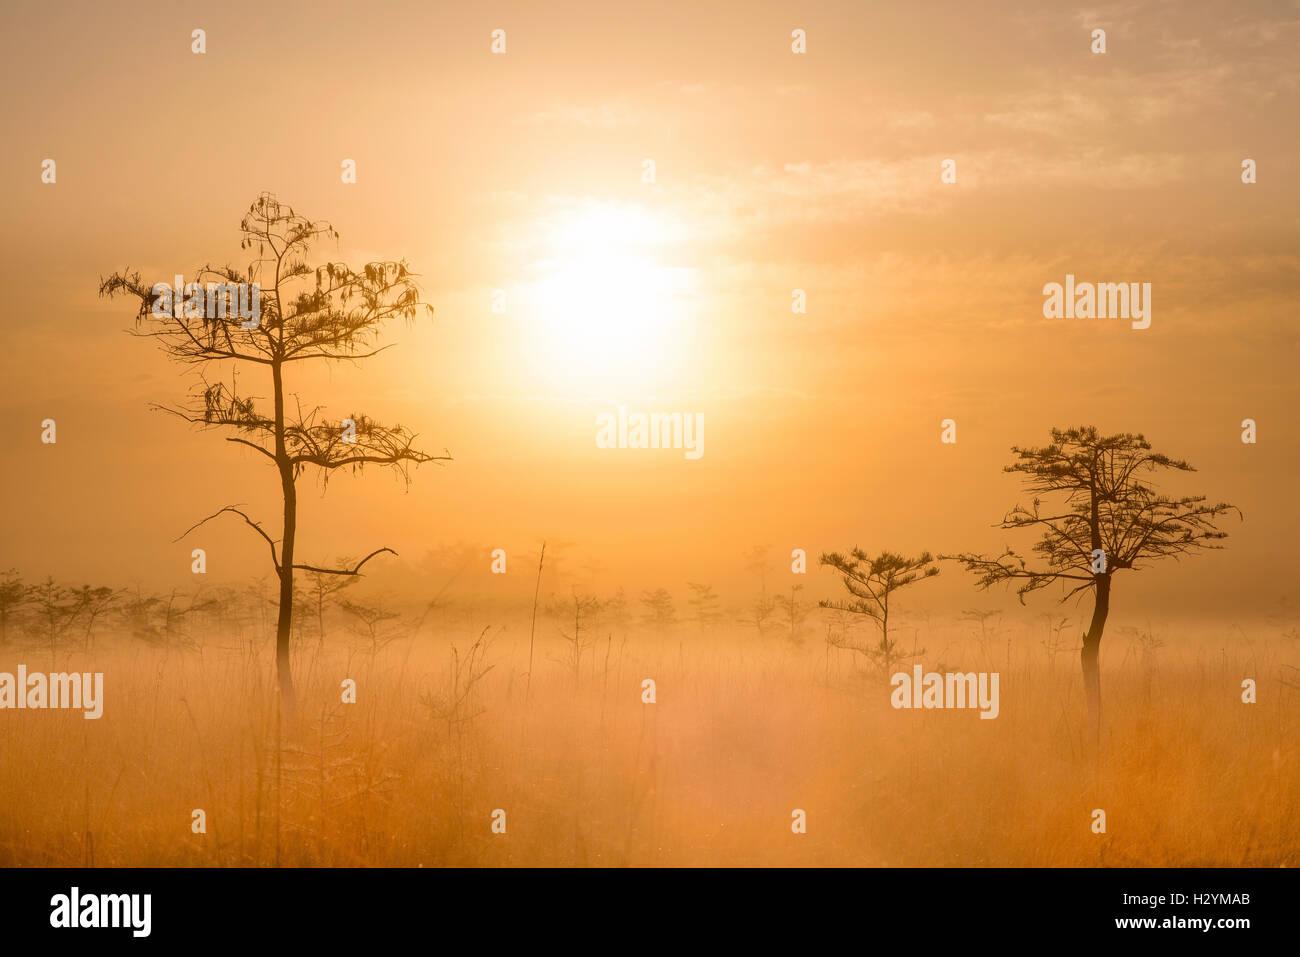 Sunrise and Dwarf Cypress (Taxodium distichum), Sawgrass Prairie, Fog, Everglades National Park, Florida USA - Stock Image